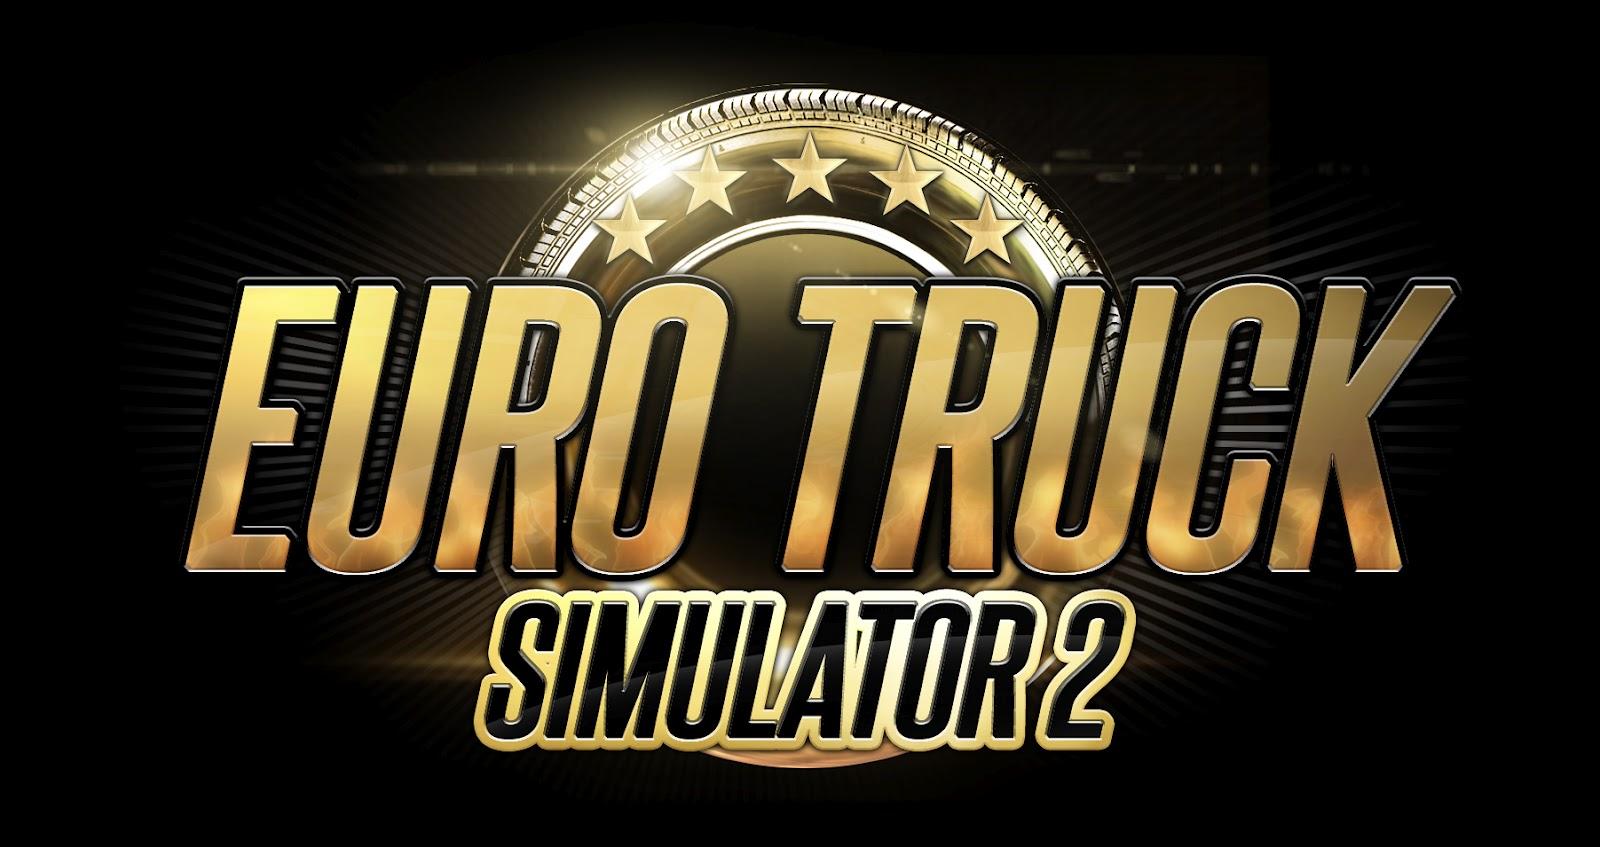 https://skidrowgamesreloaded.com/euro-truck-simulator-2/